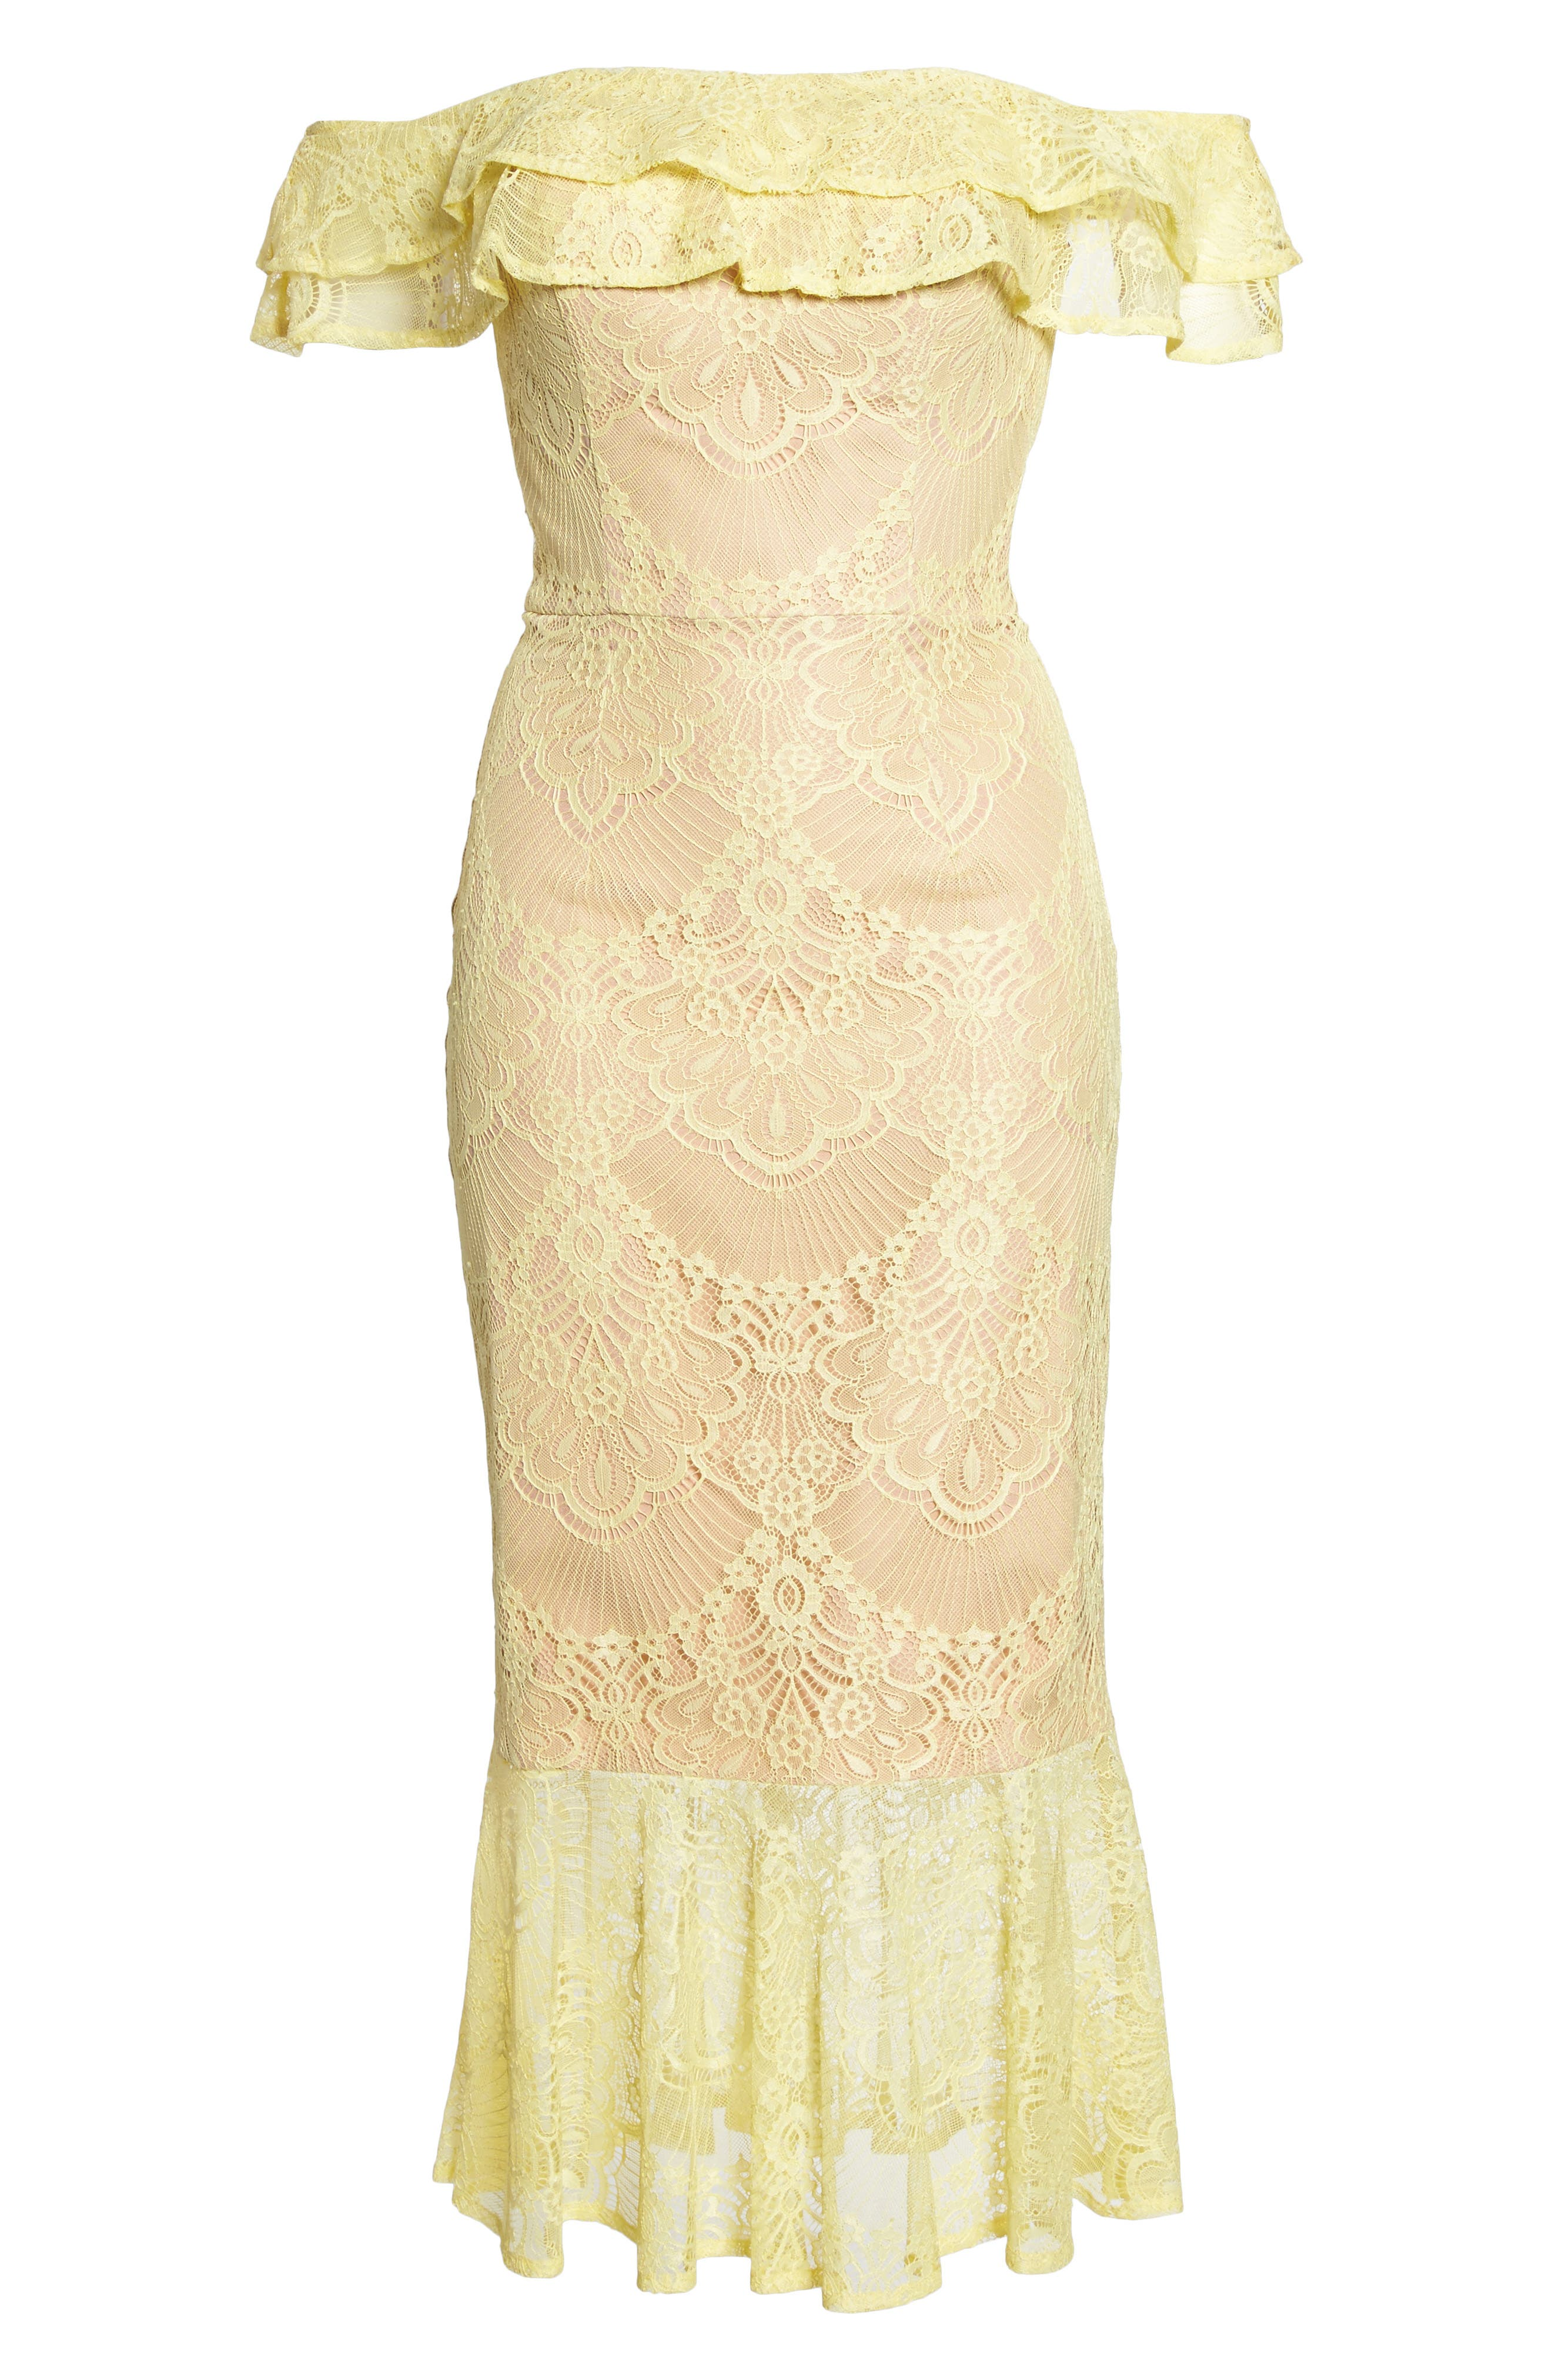 Toril Off the Shoulder Lace Midi Dress,                             Alternate thumbnail 6, color,                             742